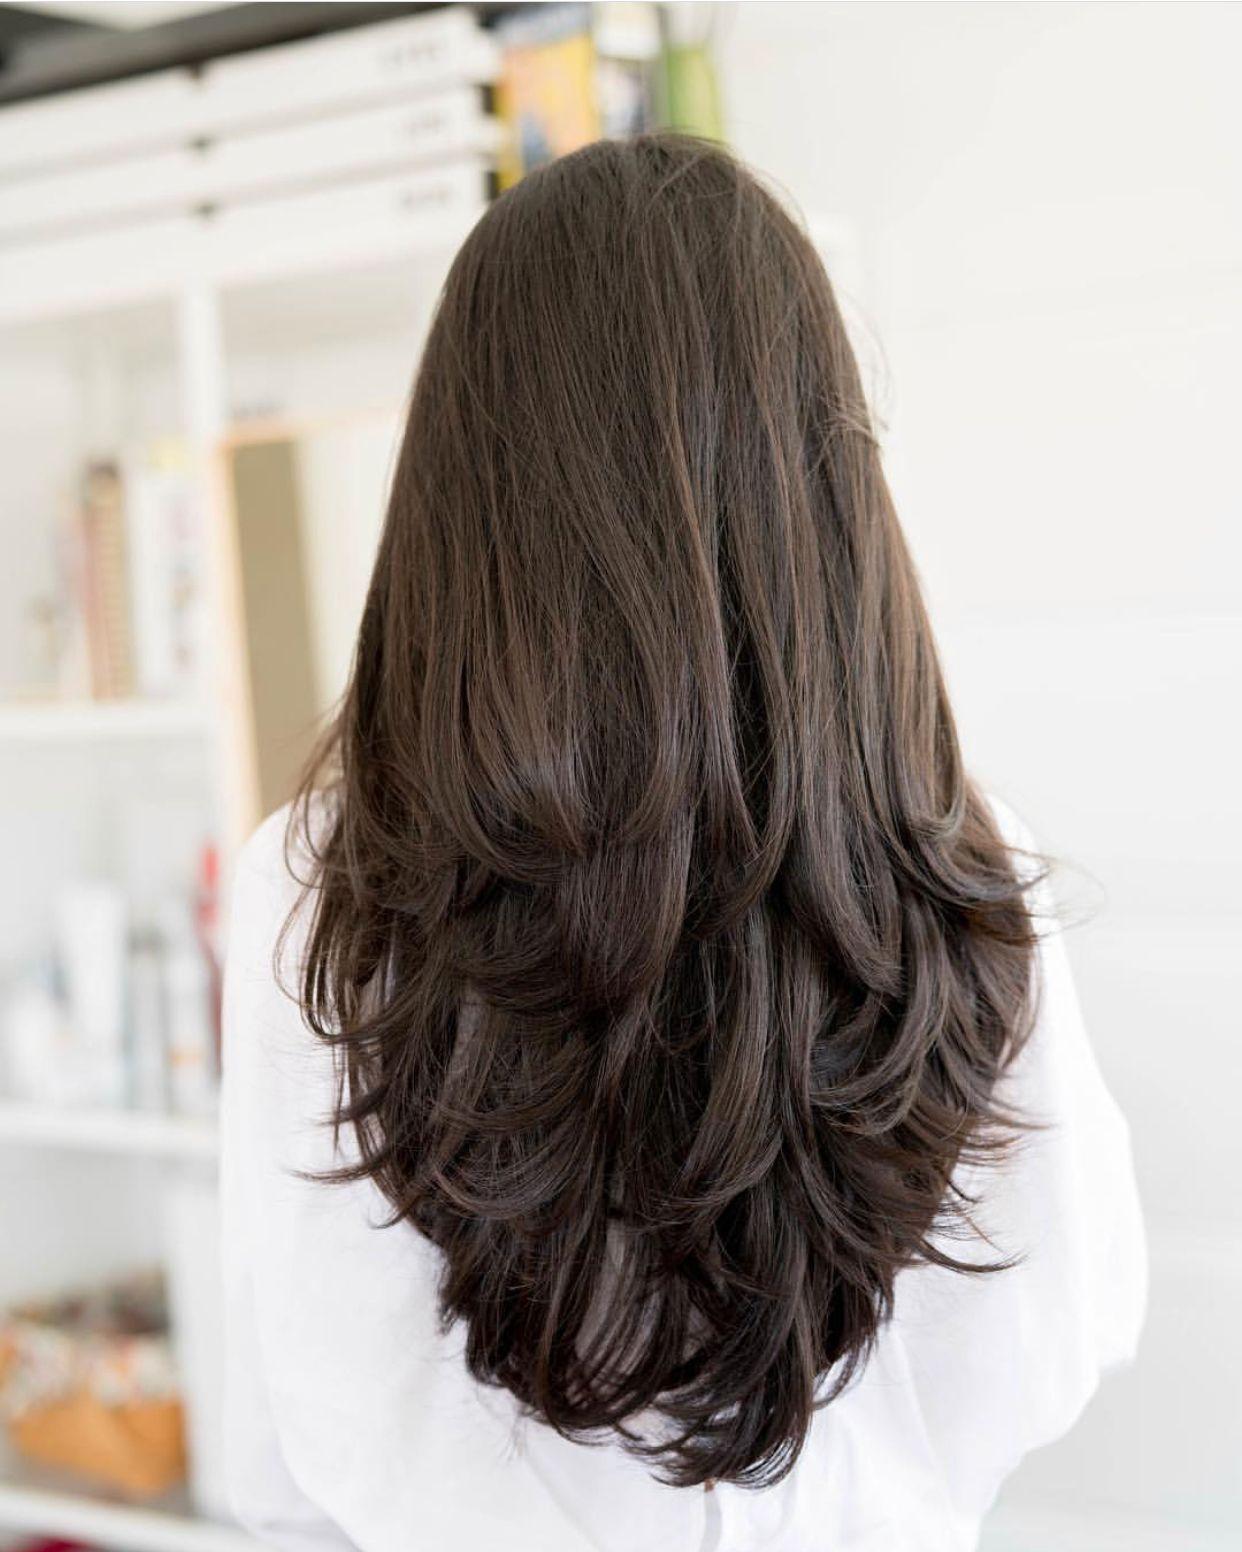 Pin Oleh Judy Di Hair Potongan Rambut Panjang Gaya Rambut Panjang Gaya Rambut